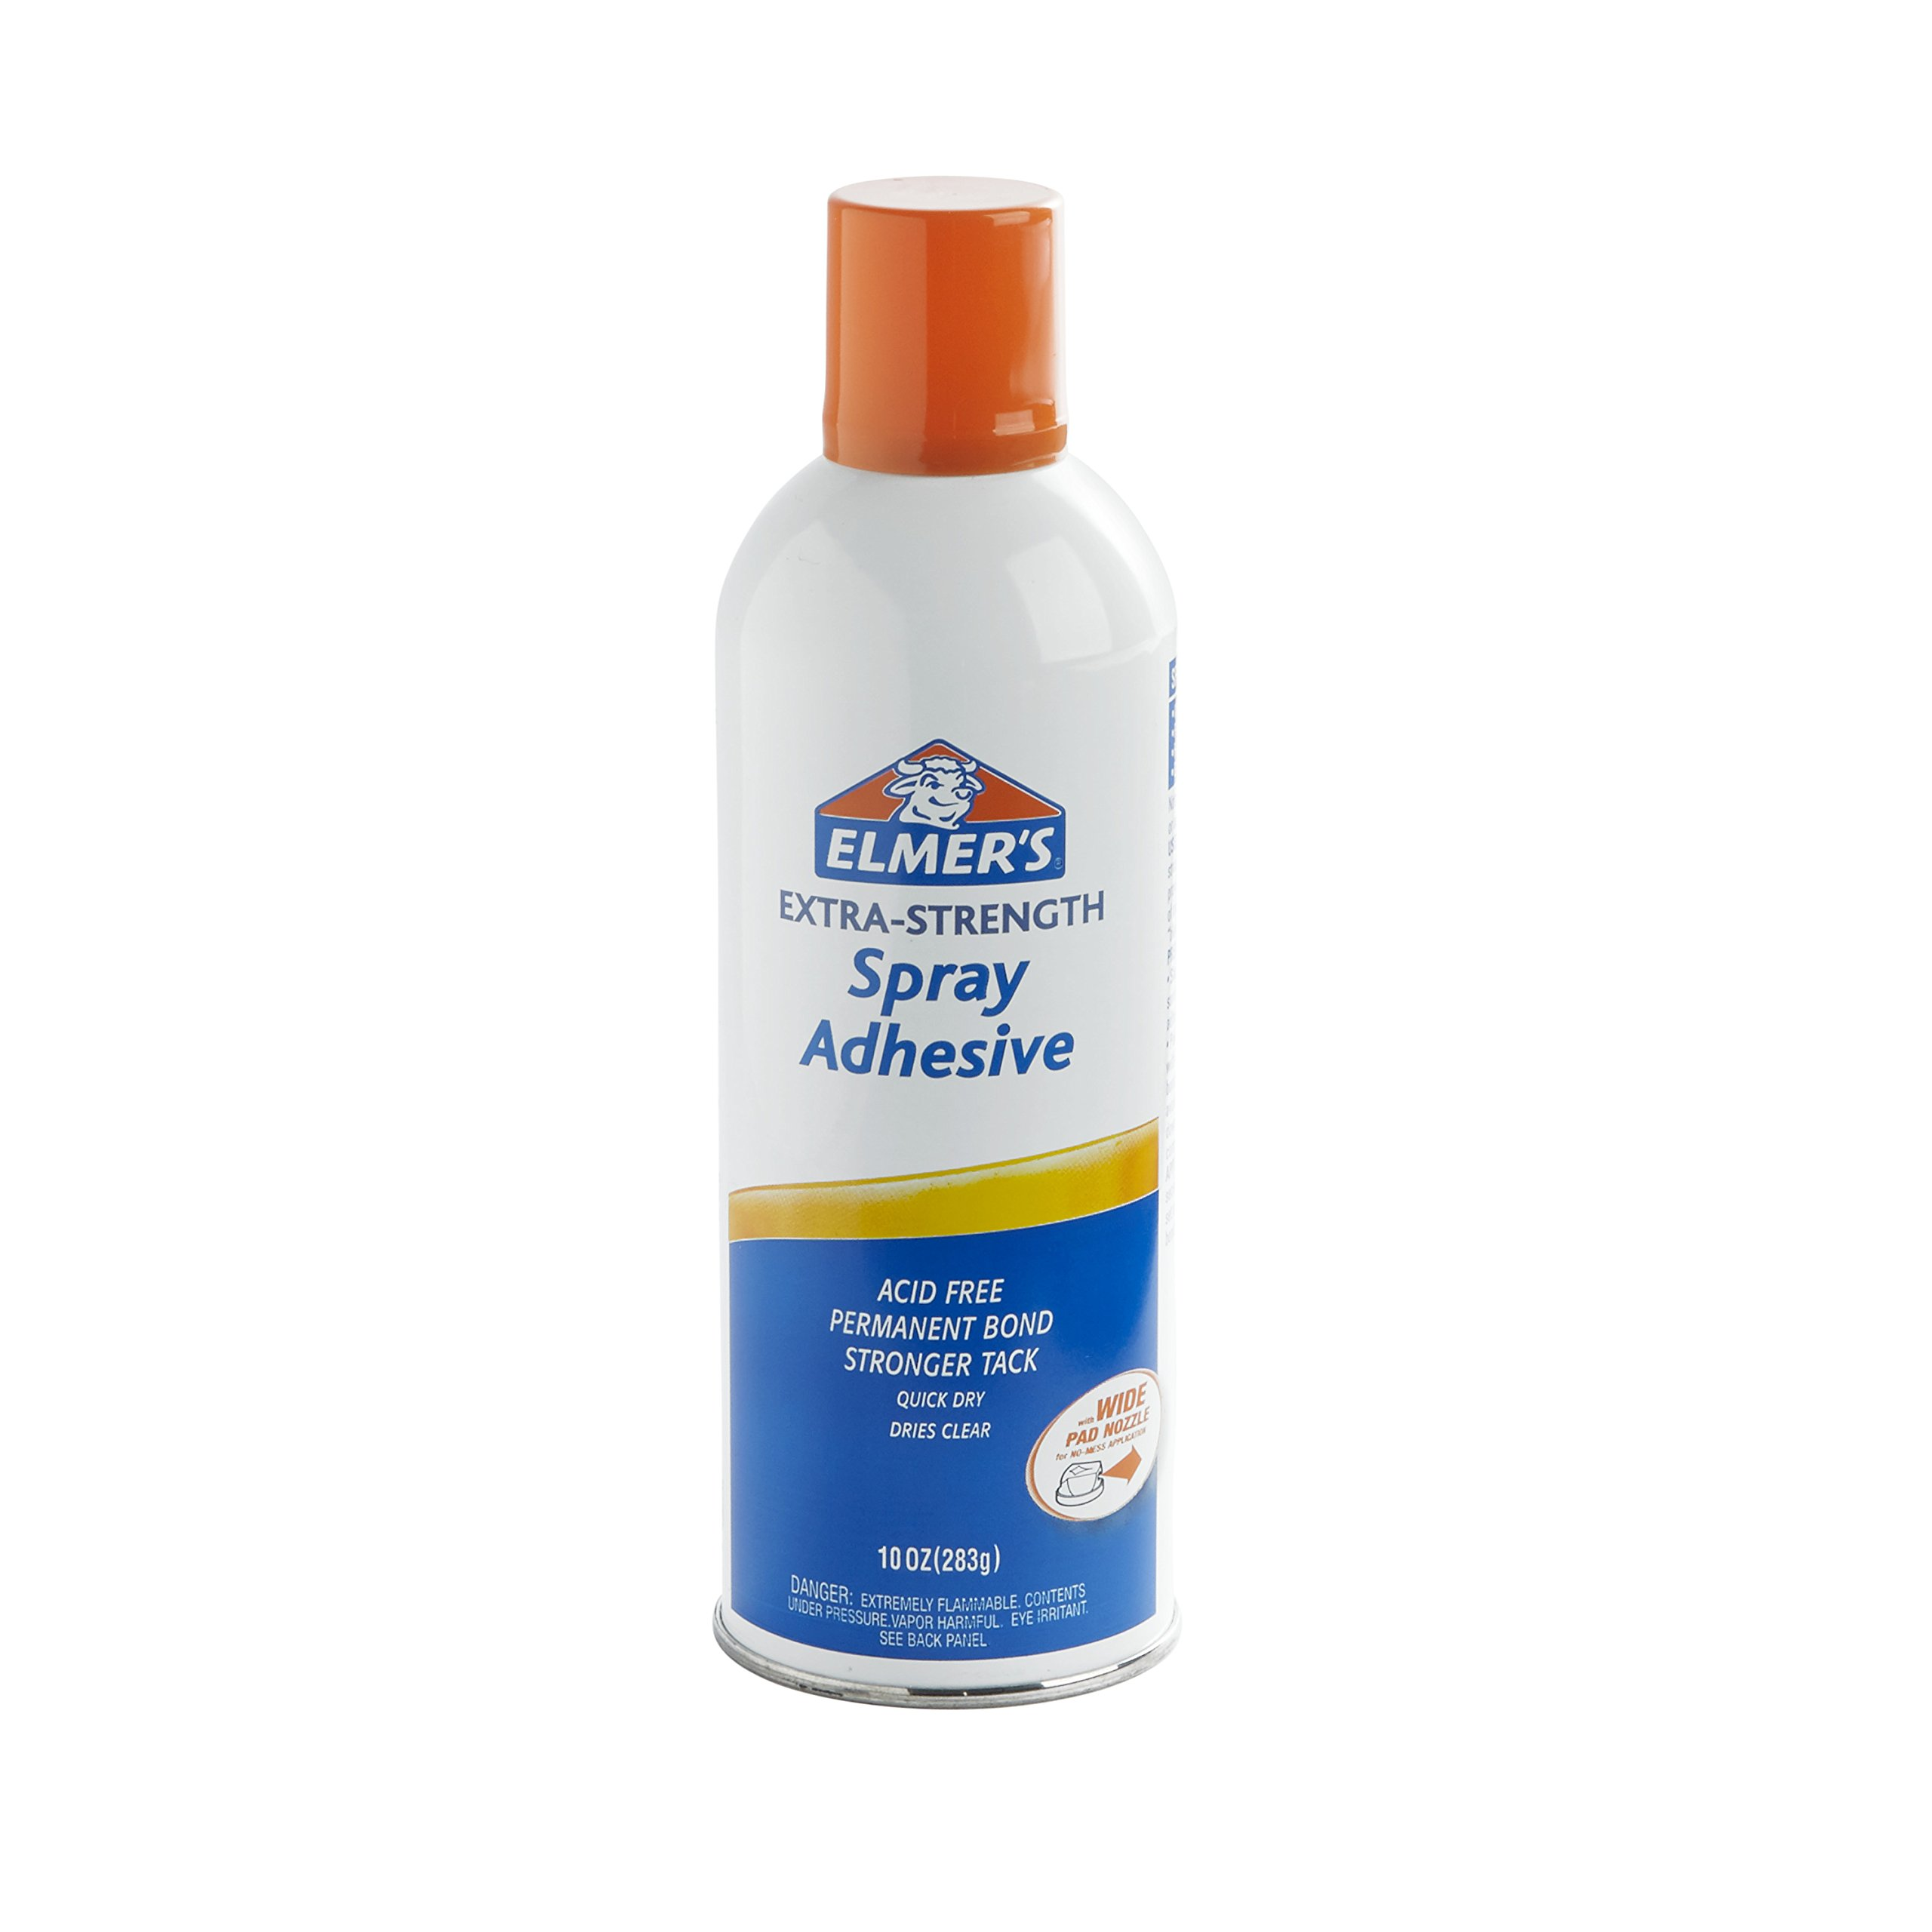 ELMERS Extra Strength Spray Adhesive, 10 Oz, Clear (E456)